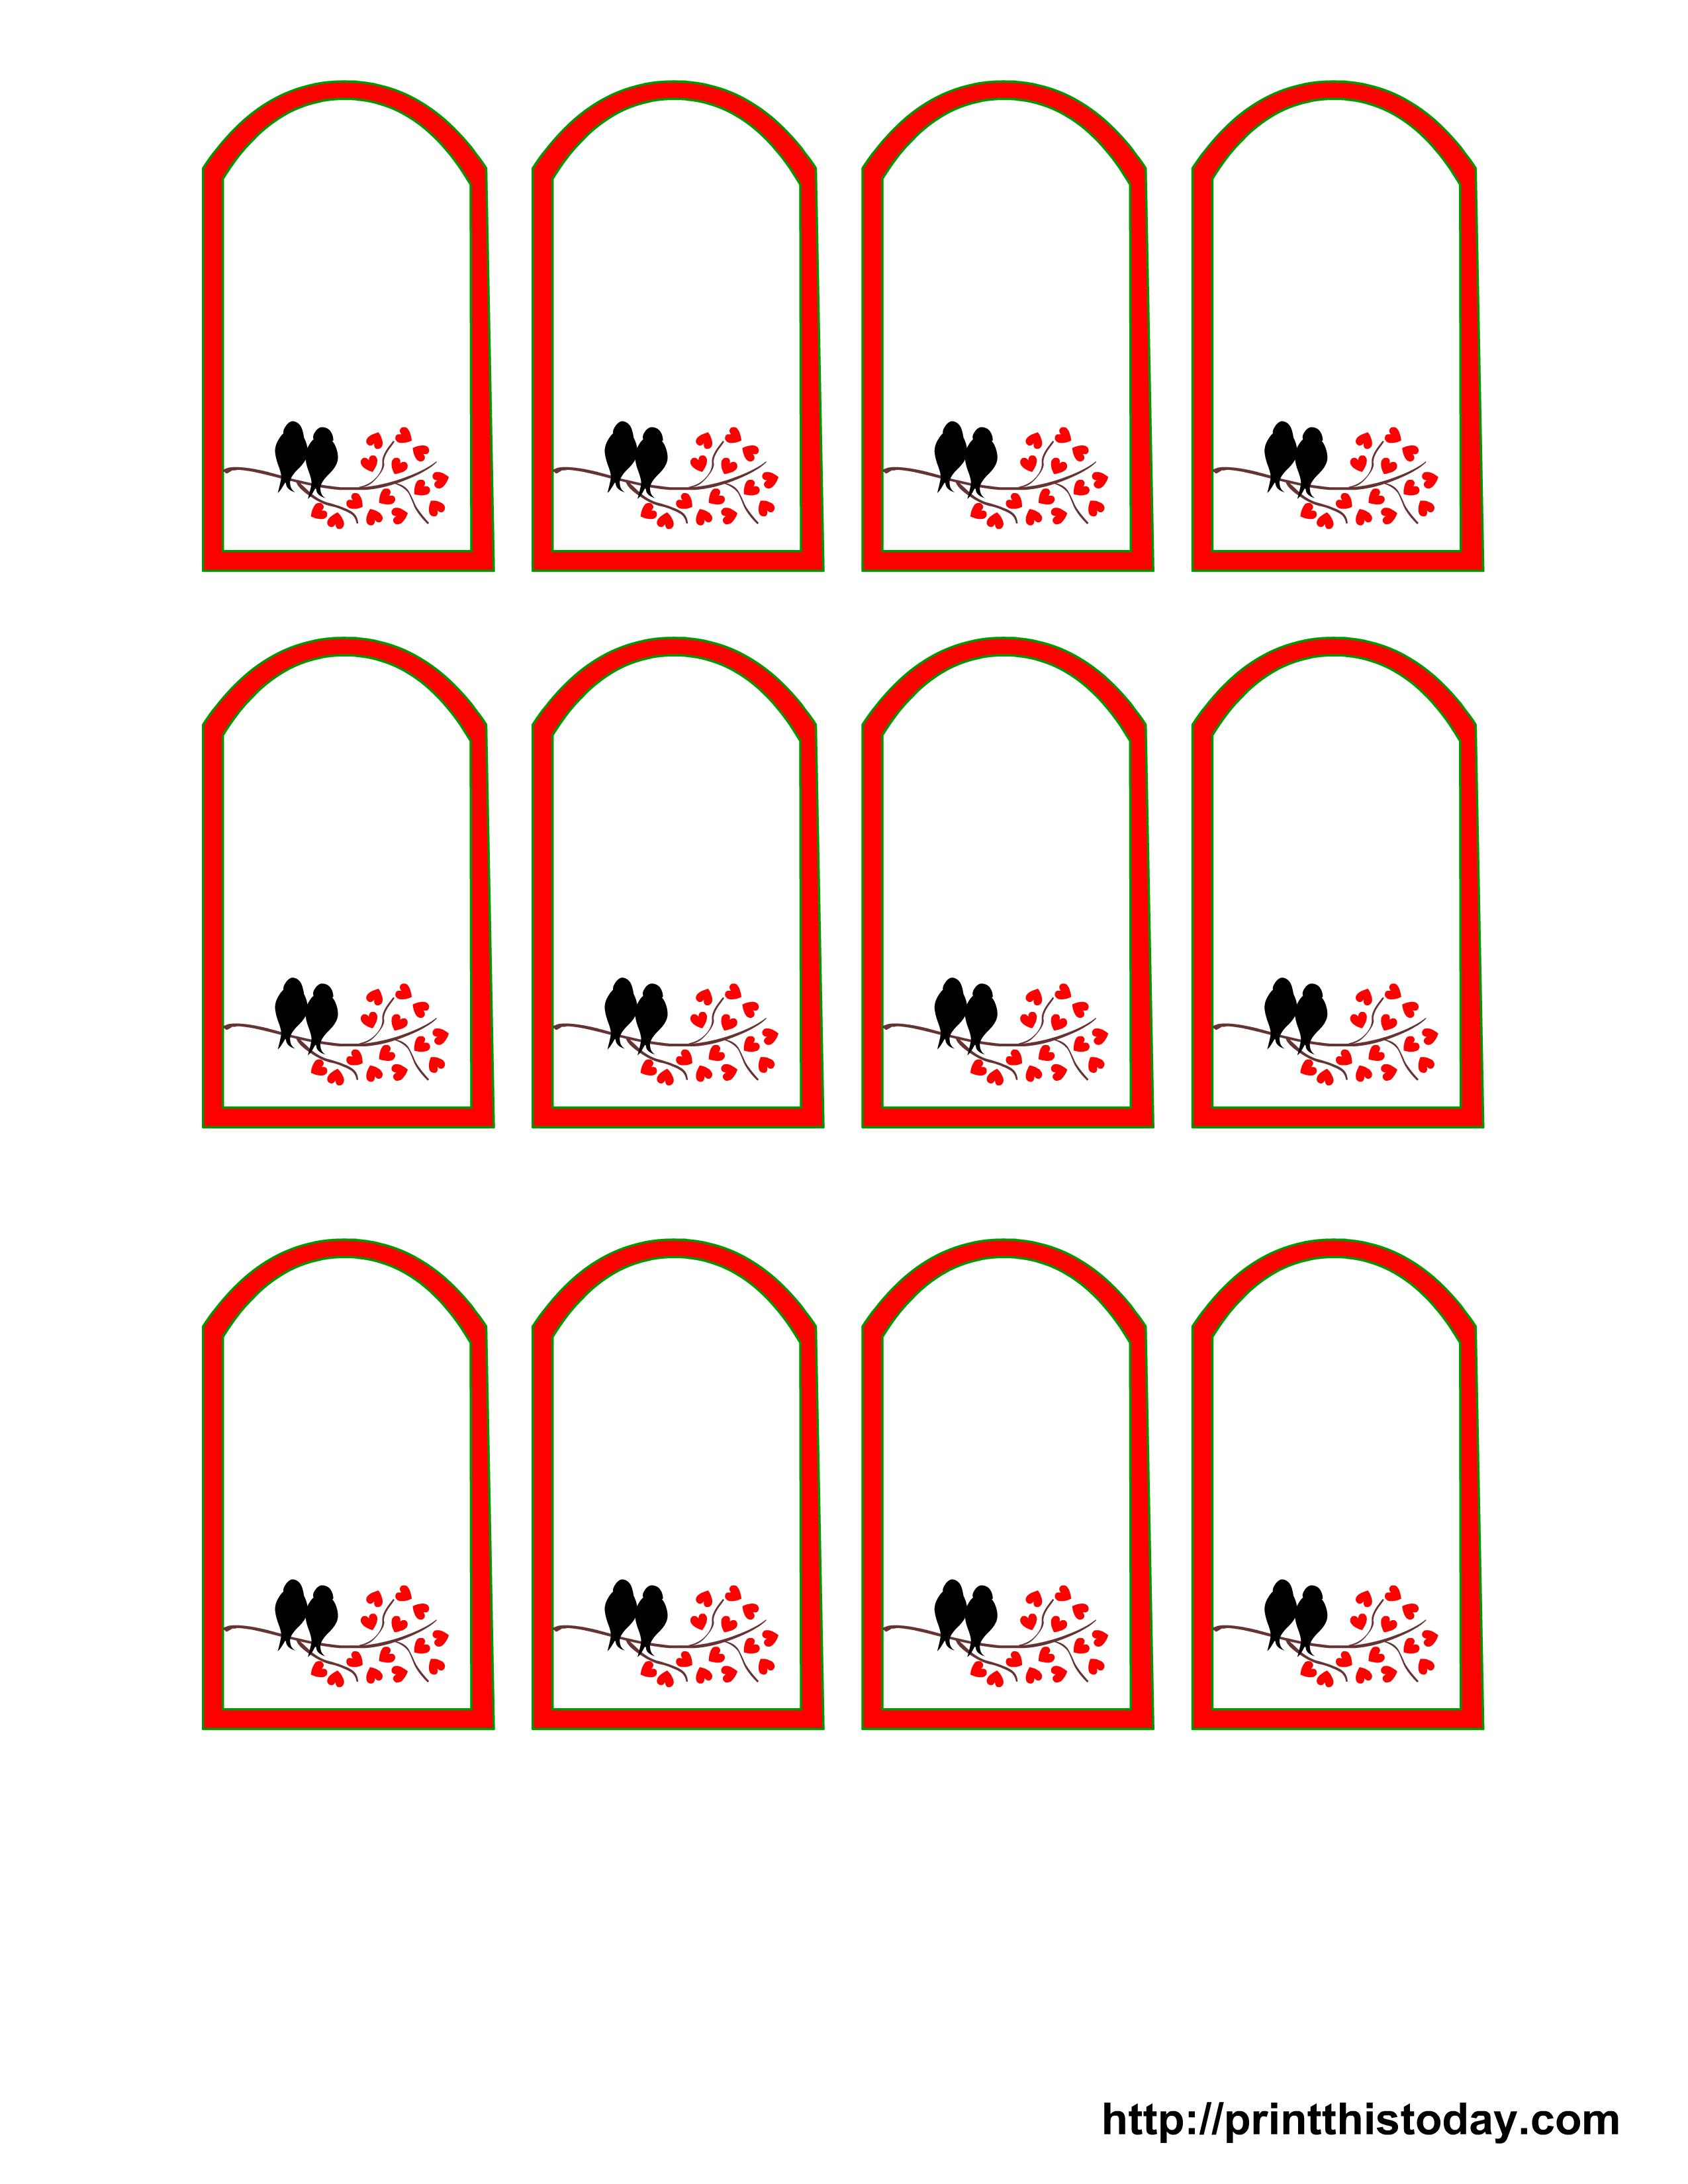 Free Printables Wedding | Free Printable Wedding Favor Tags | Print - Free Printable Wedding Favor Tags